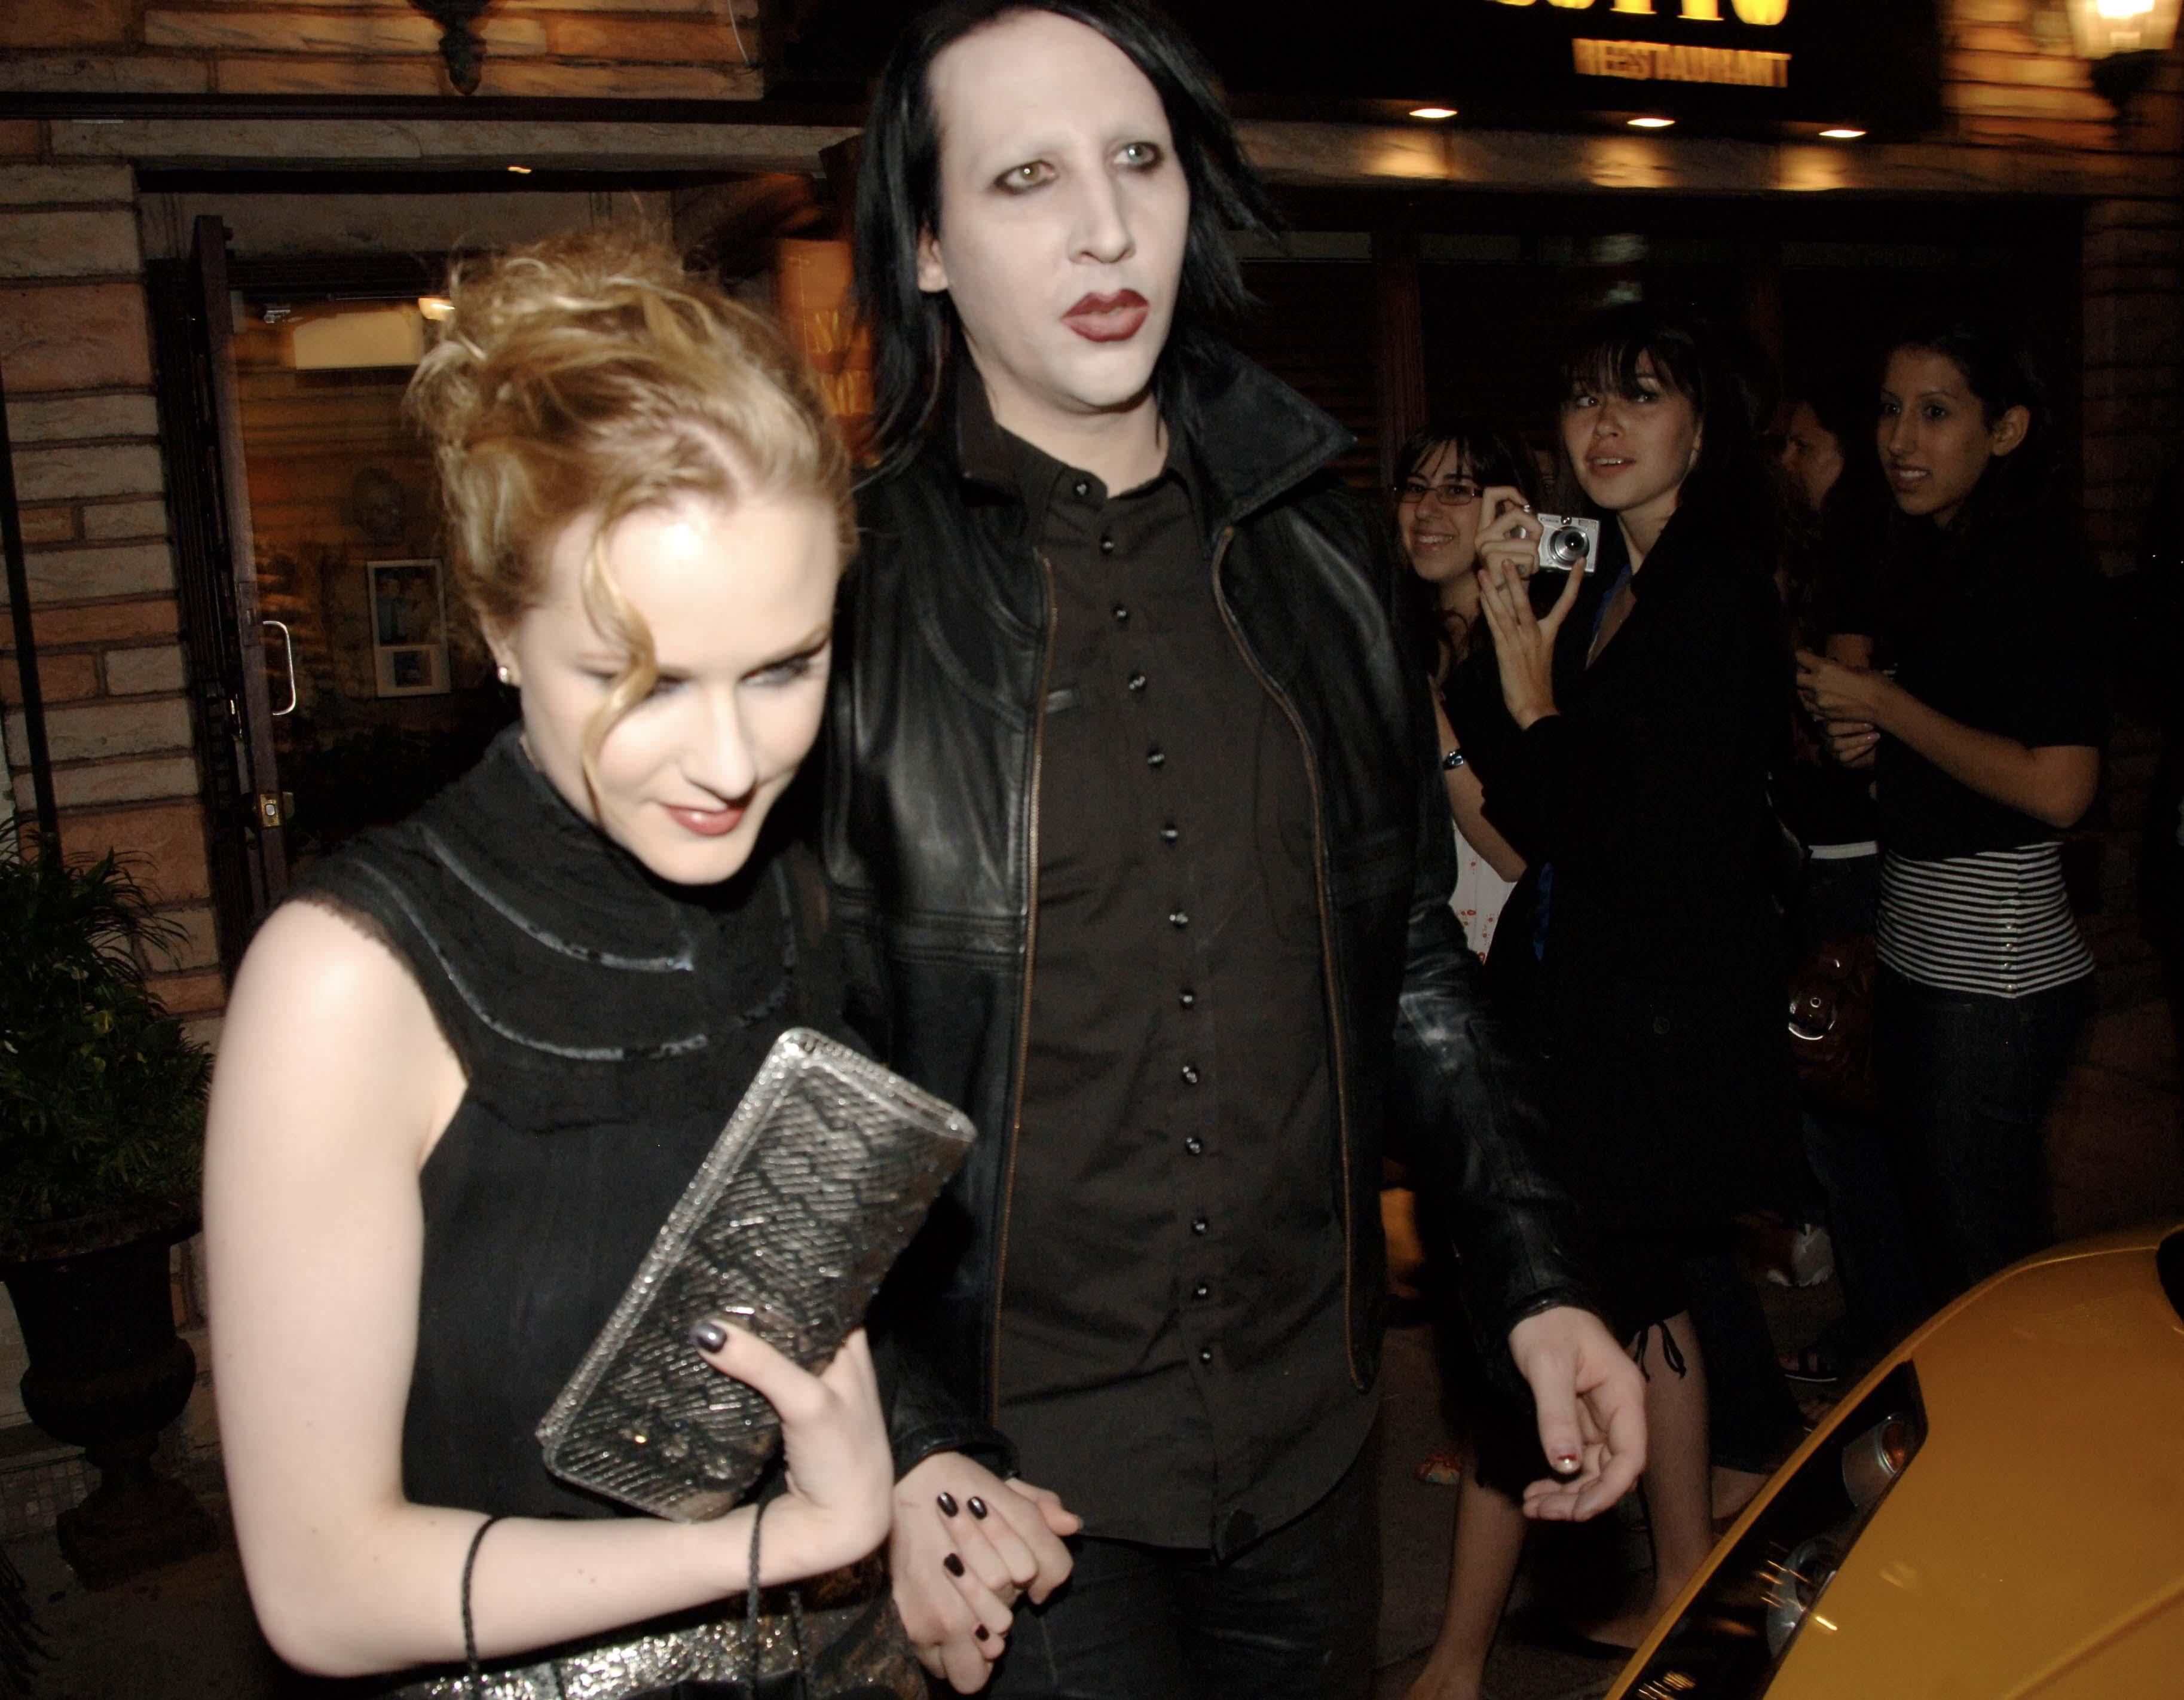 Marilyn Manson and Evan Rachel Wood l